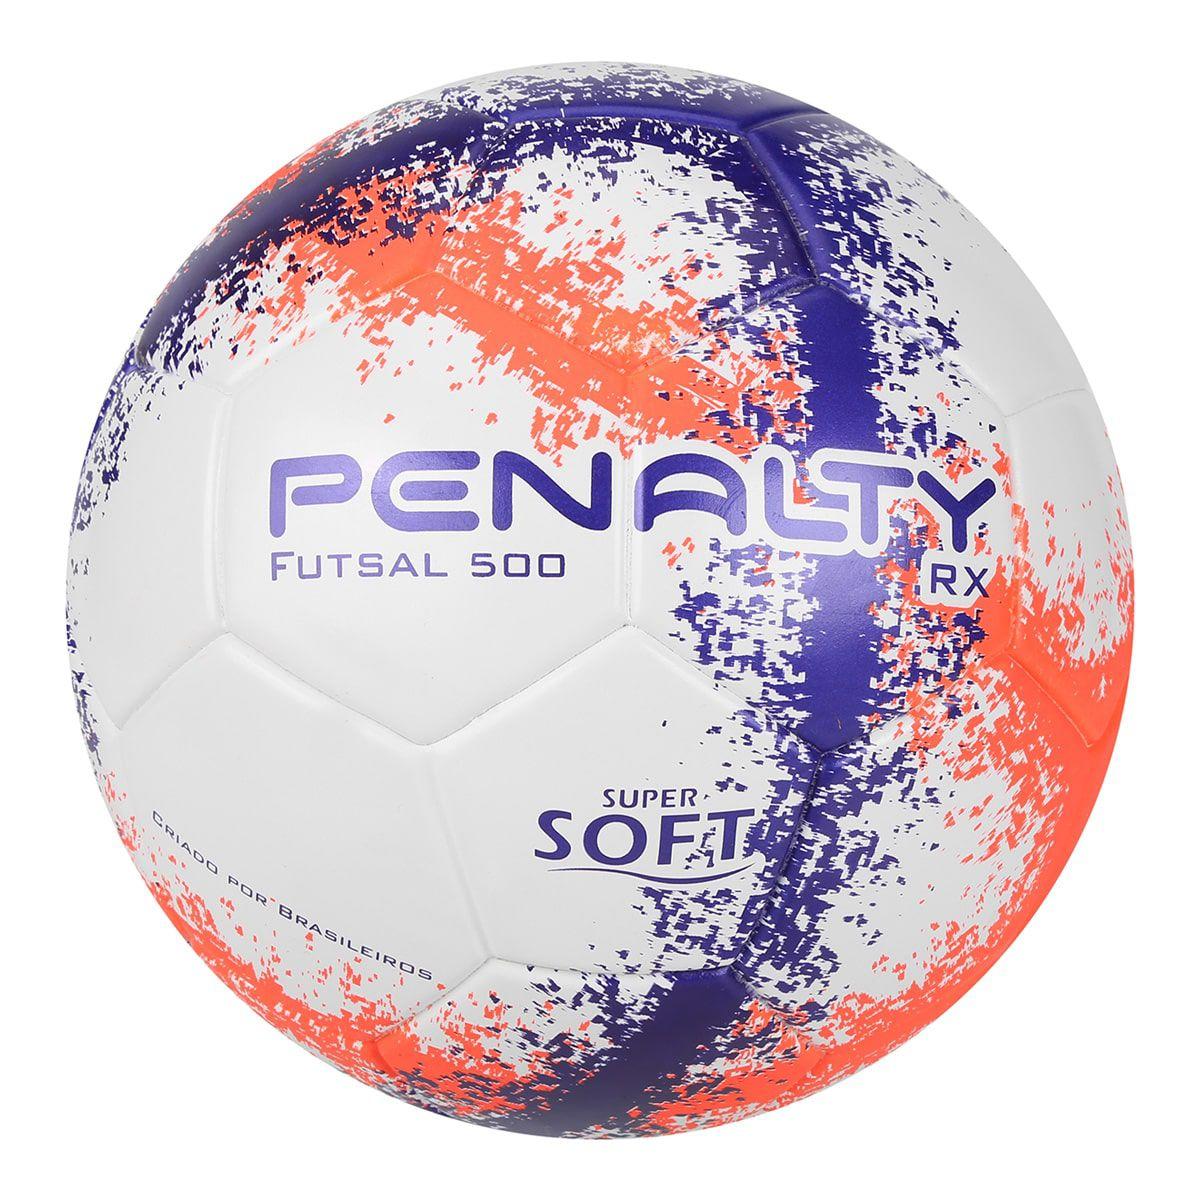 Bola Futsal Penalty RX 500 R3 Fusion VIII